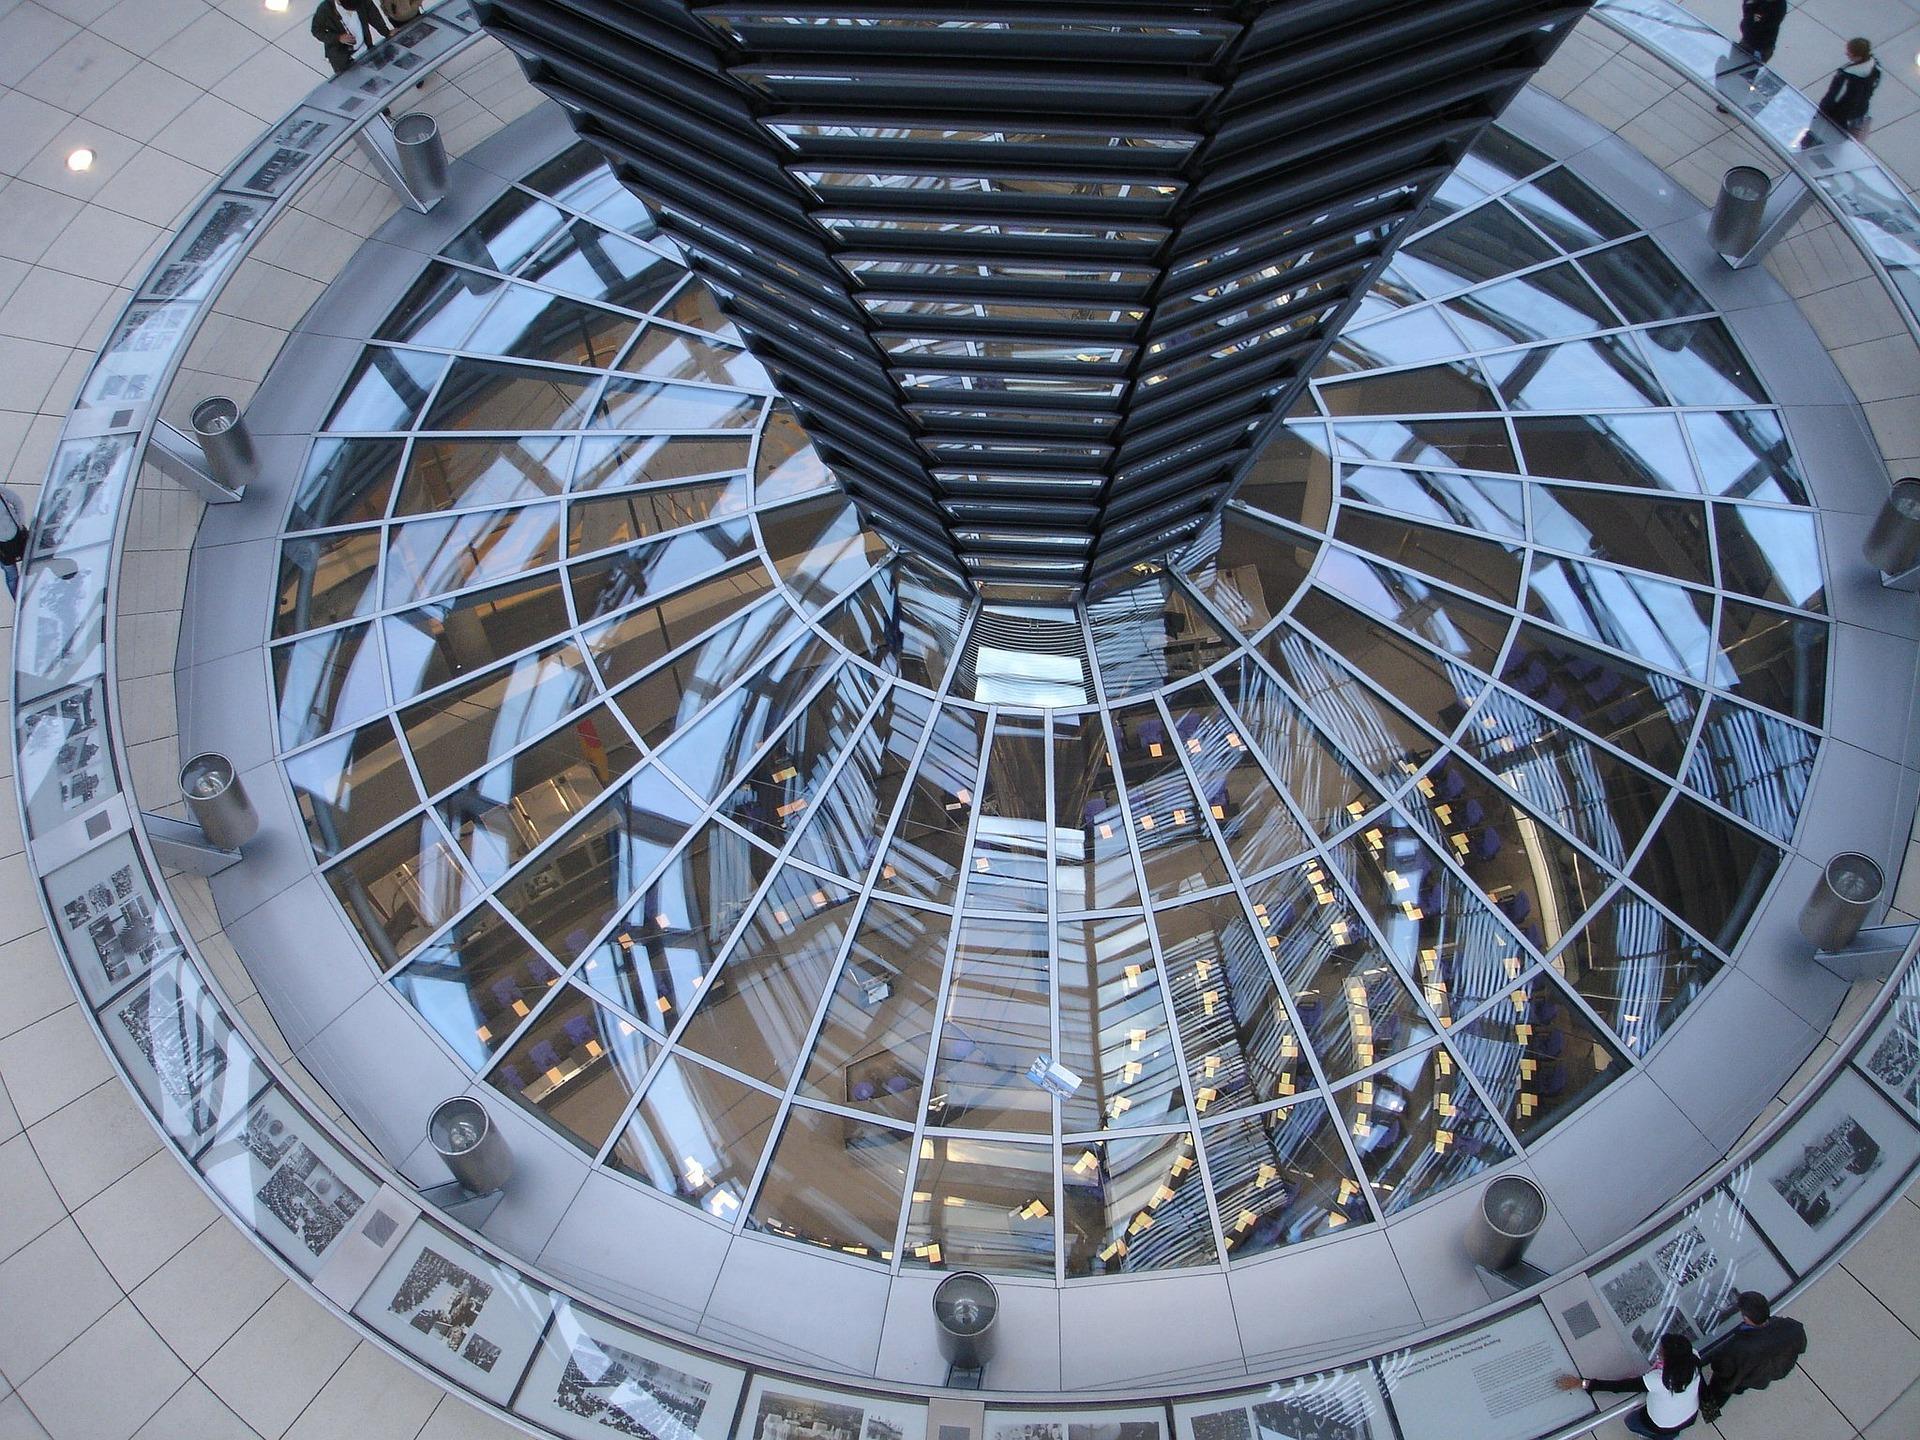 Idea #10 | The exemplary Edge smart office building